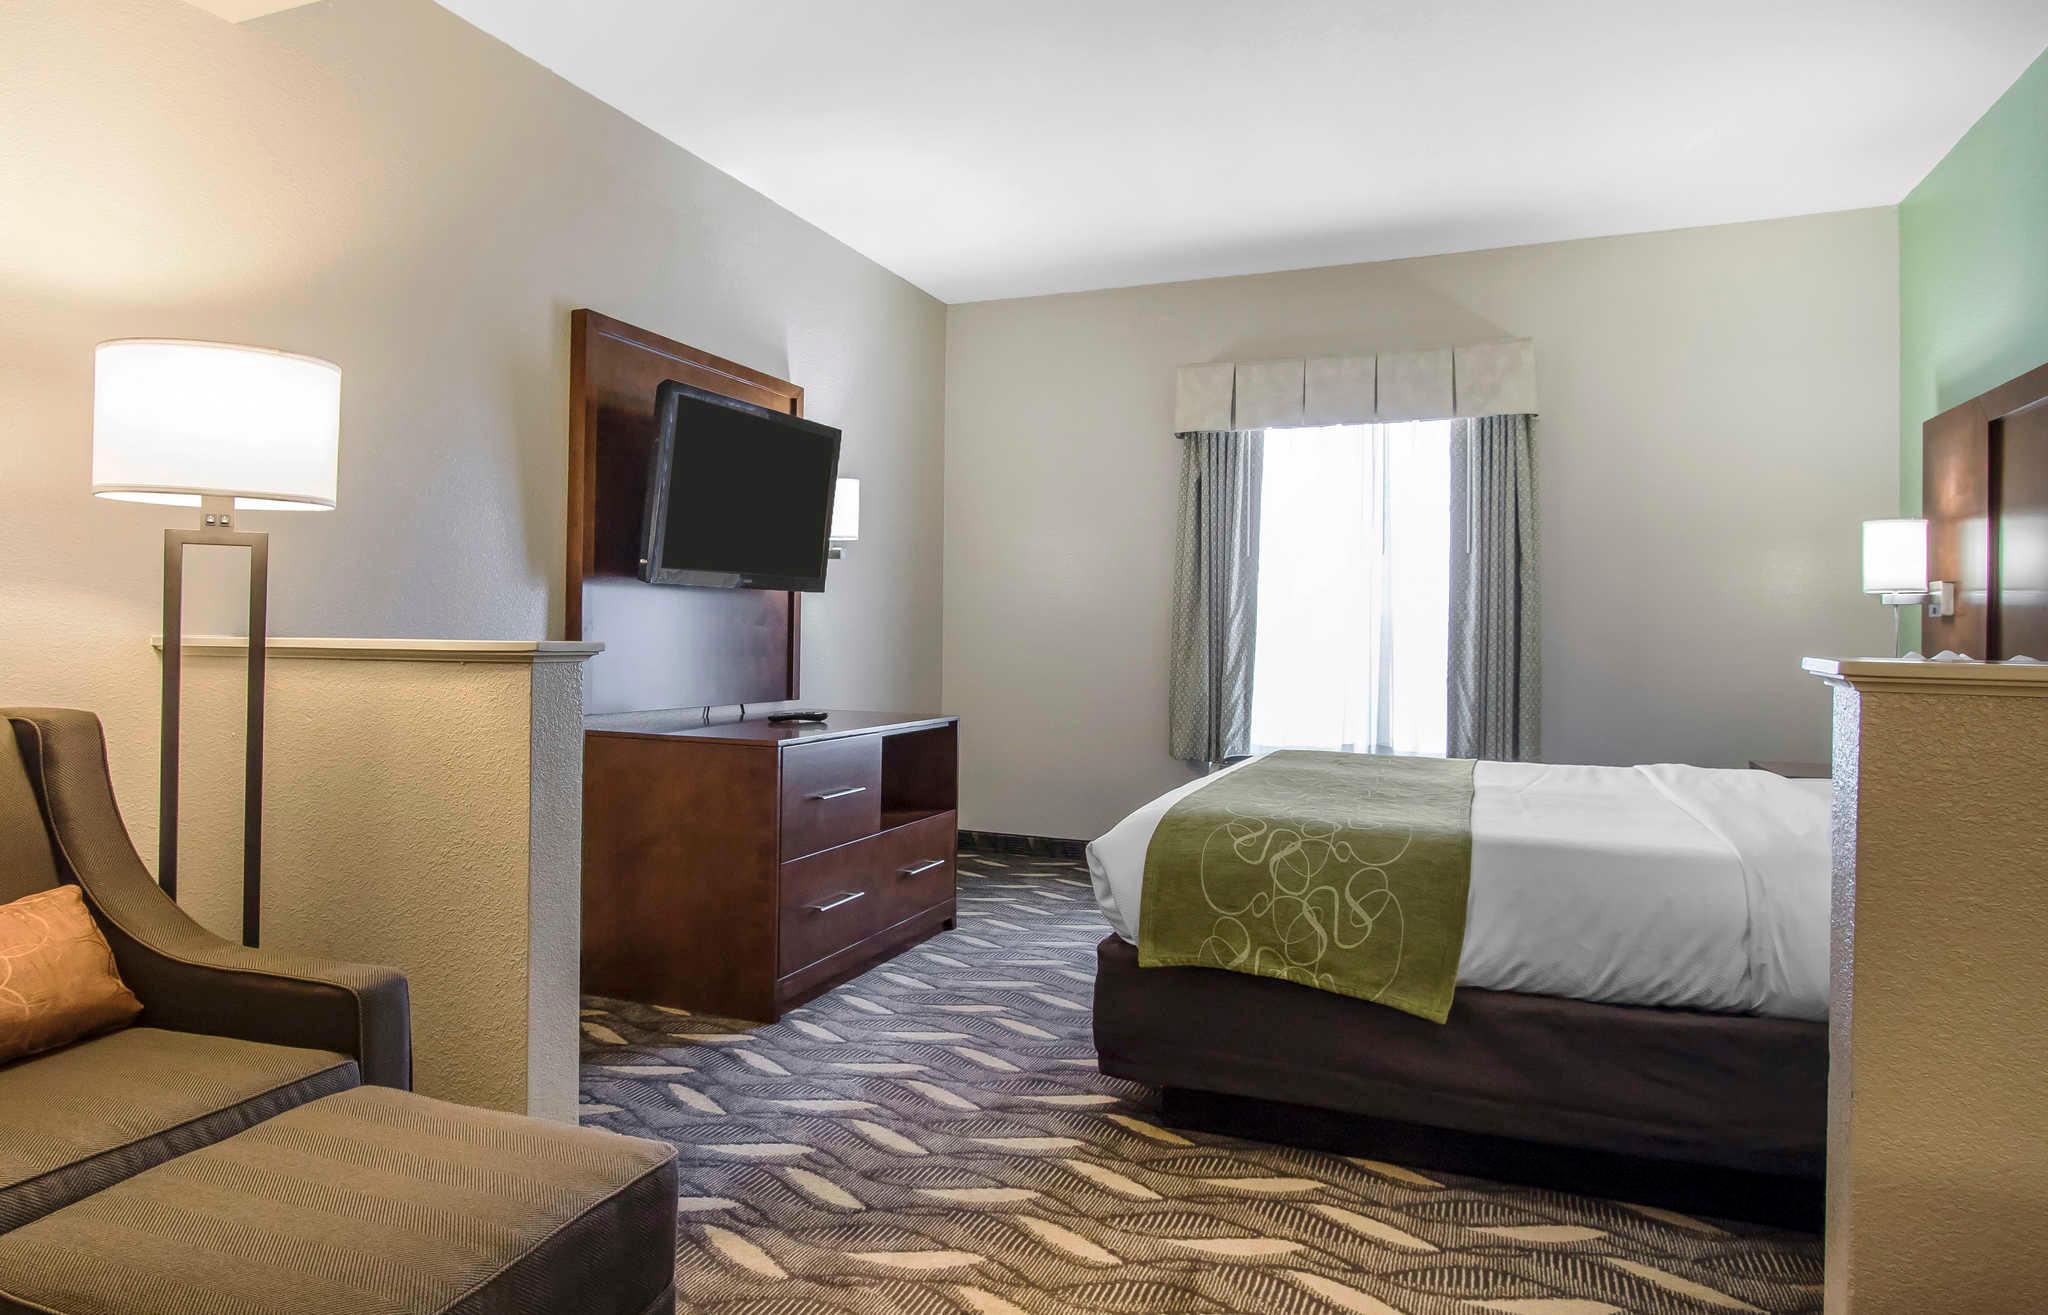 Comfort Suites image 15